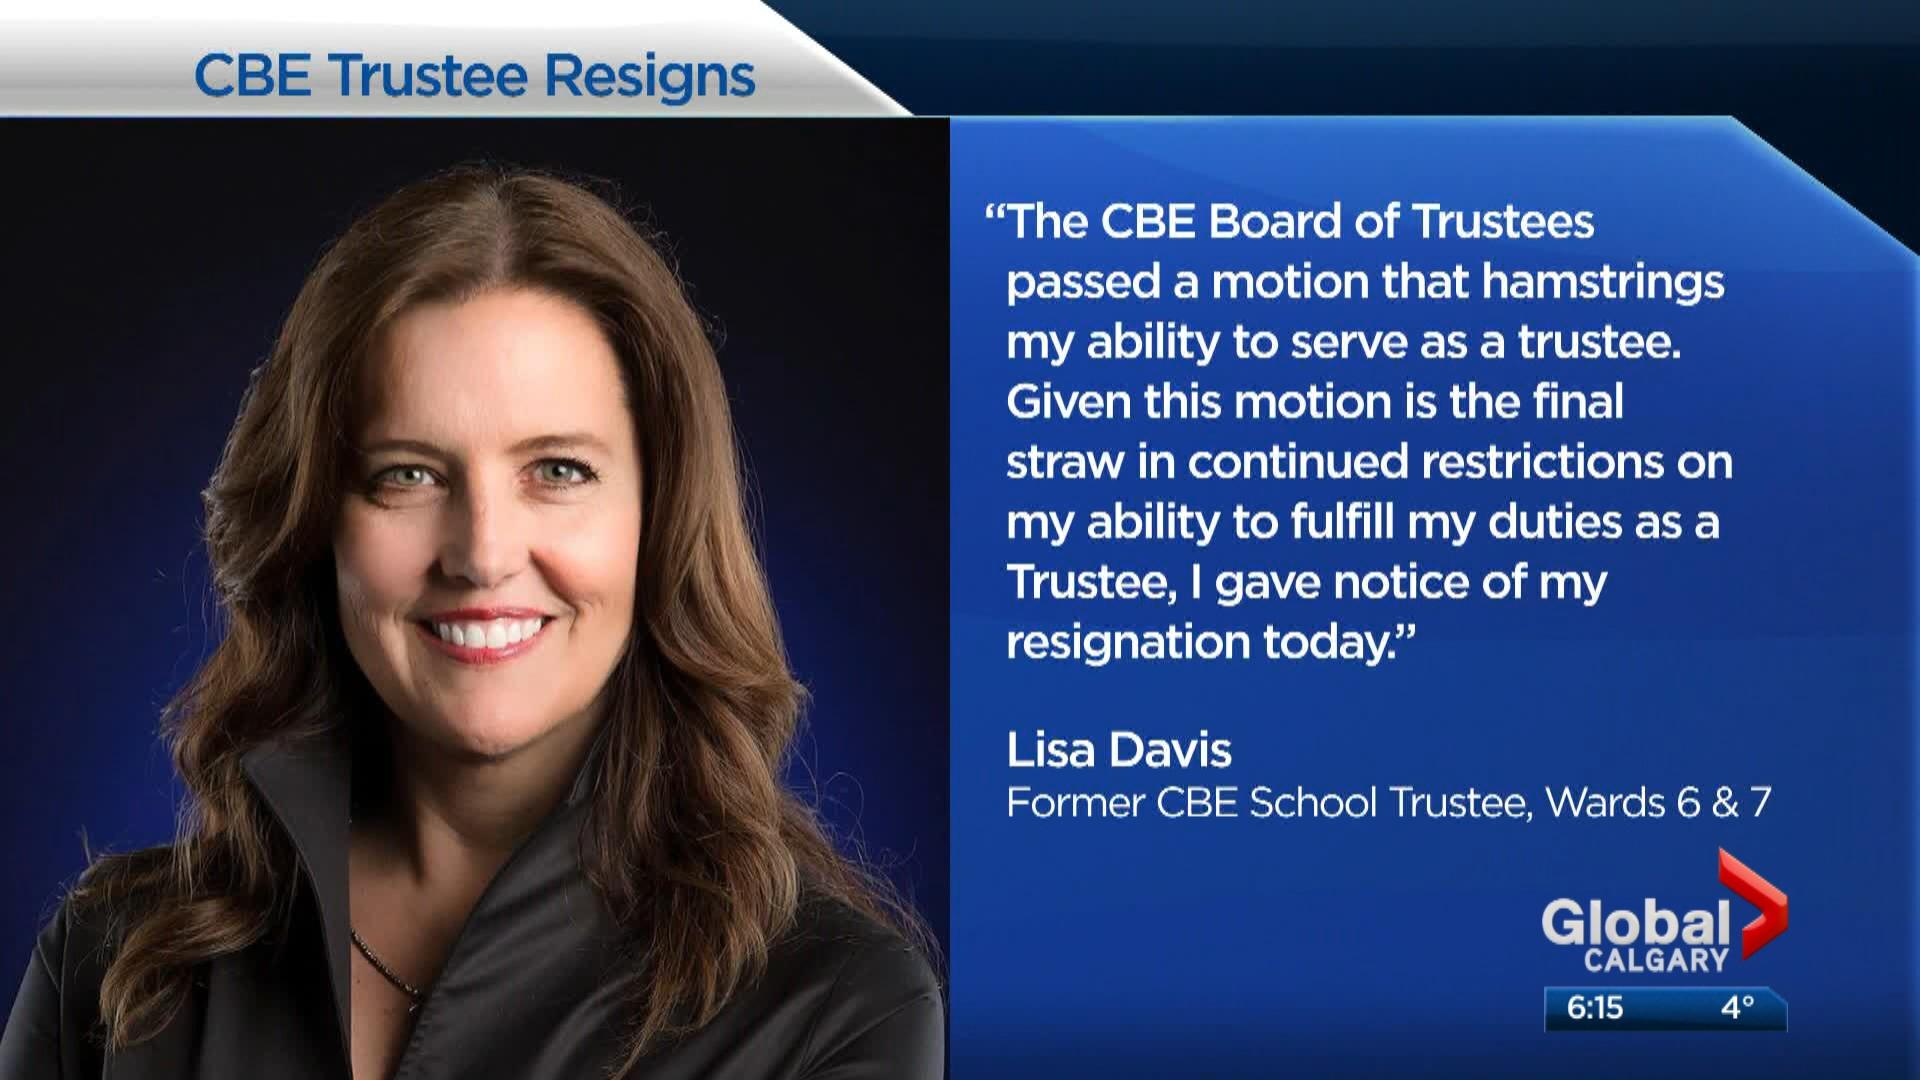 CBE trustee resigns, accuses board of secrecy